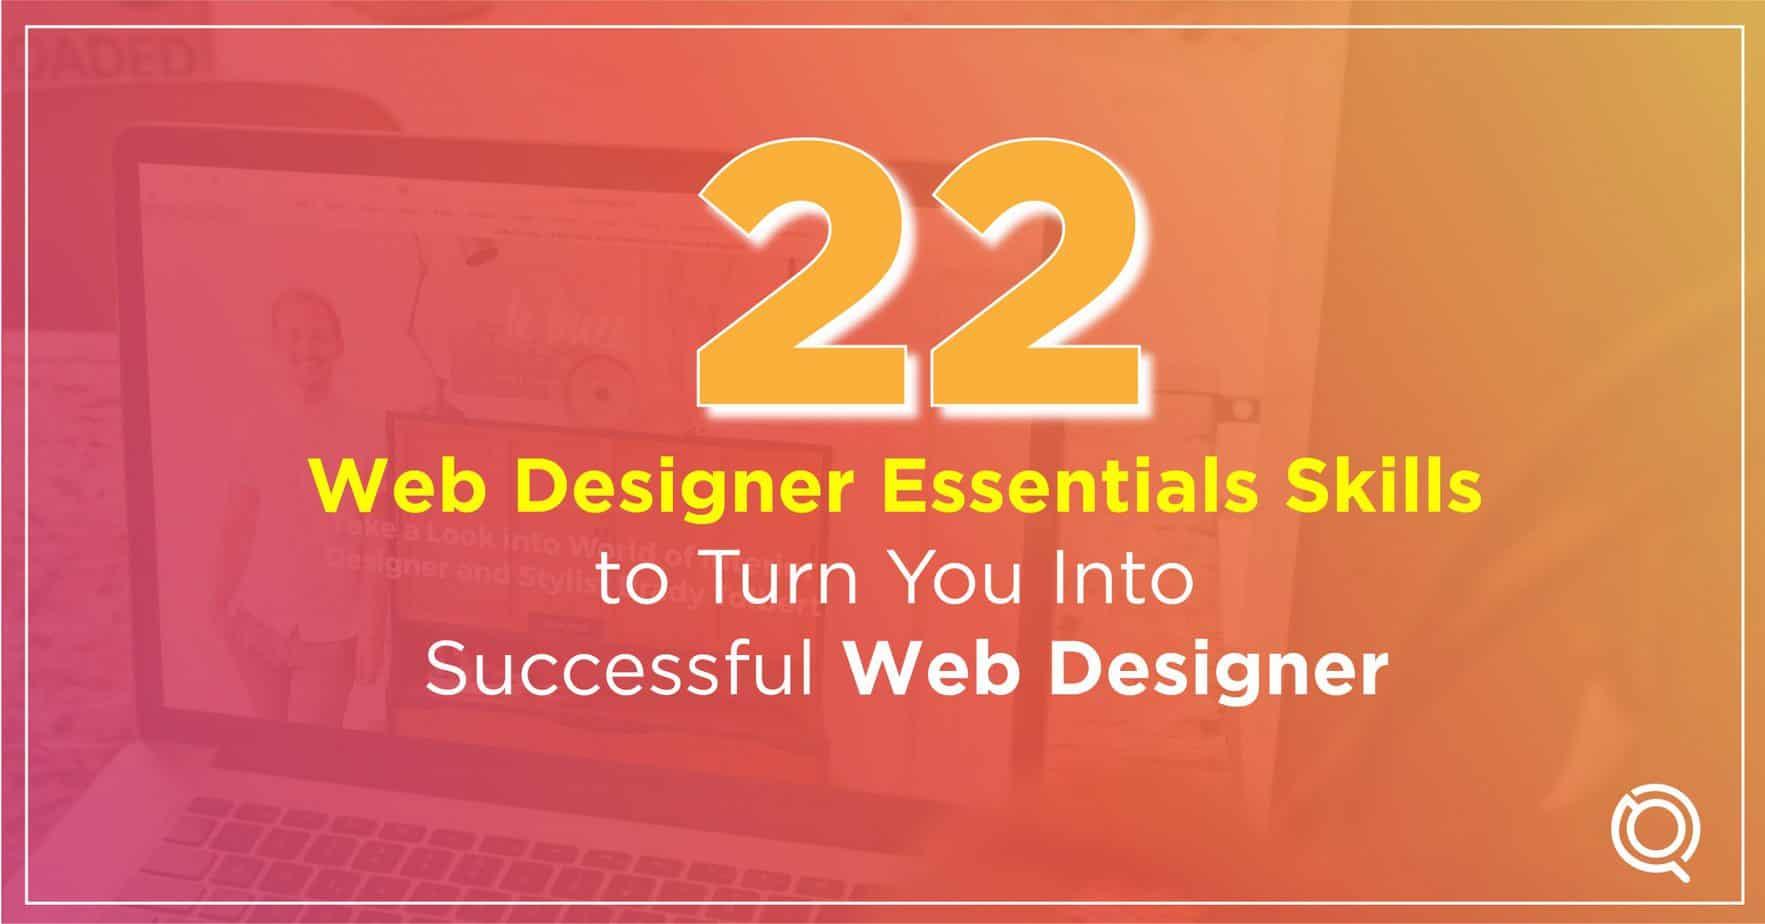 22 Web Designer Essentials Skills to Turn You Into A Successful Web Designer - One Search Pro Digital Marketing Agency